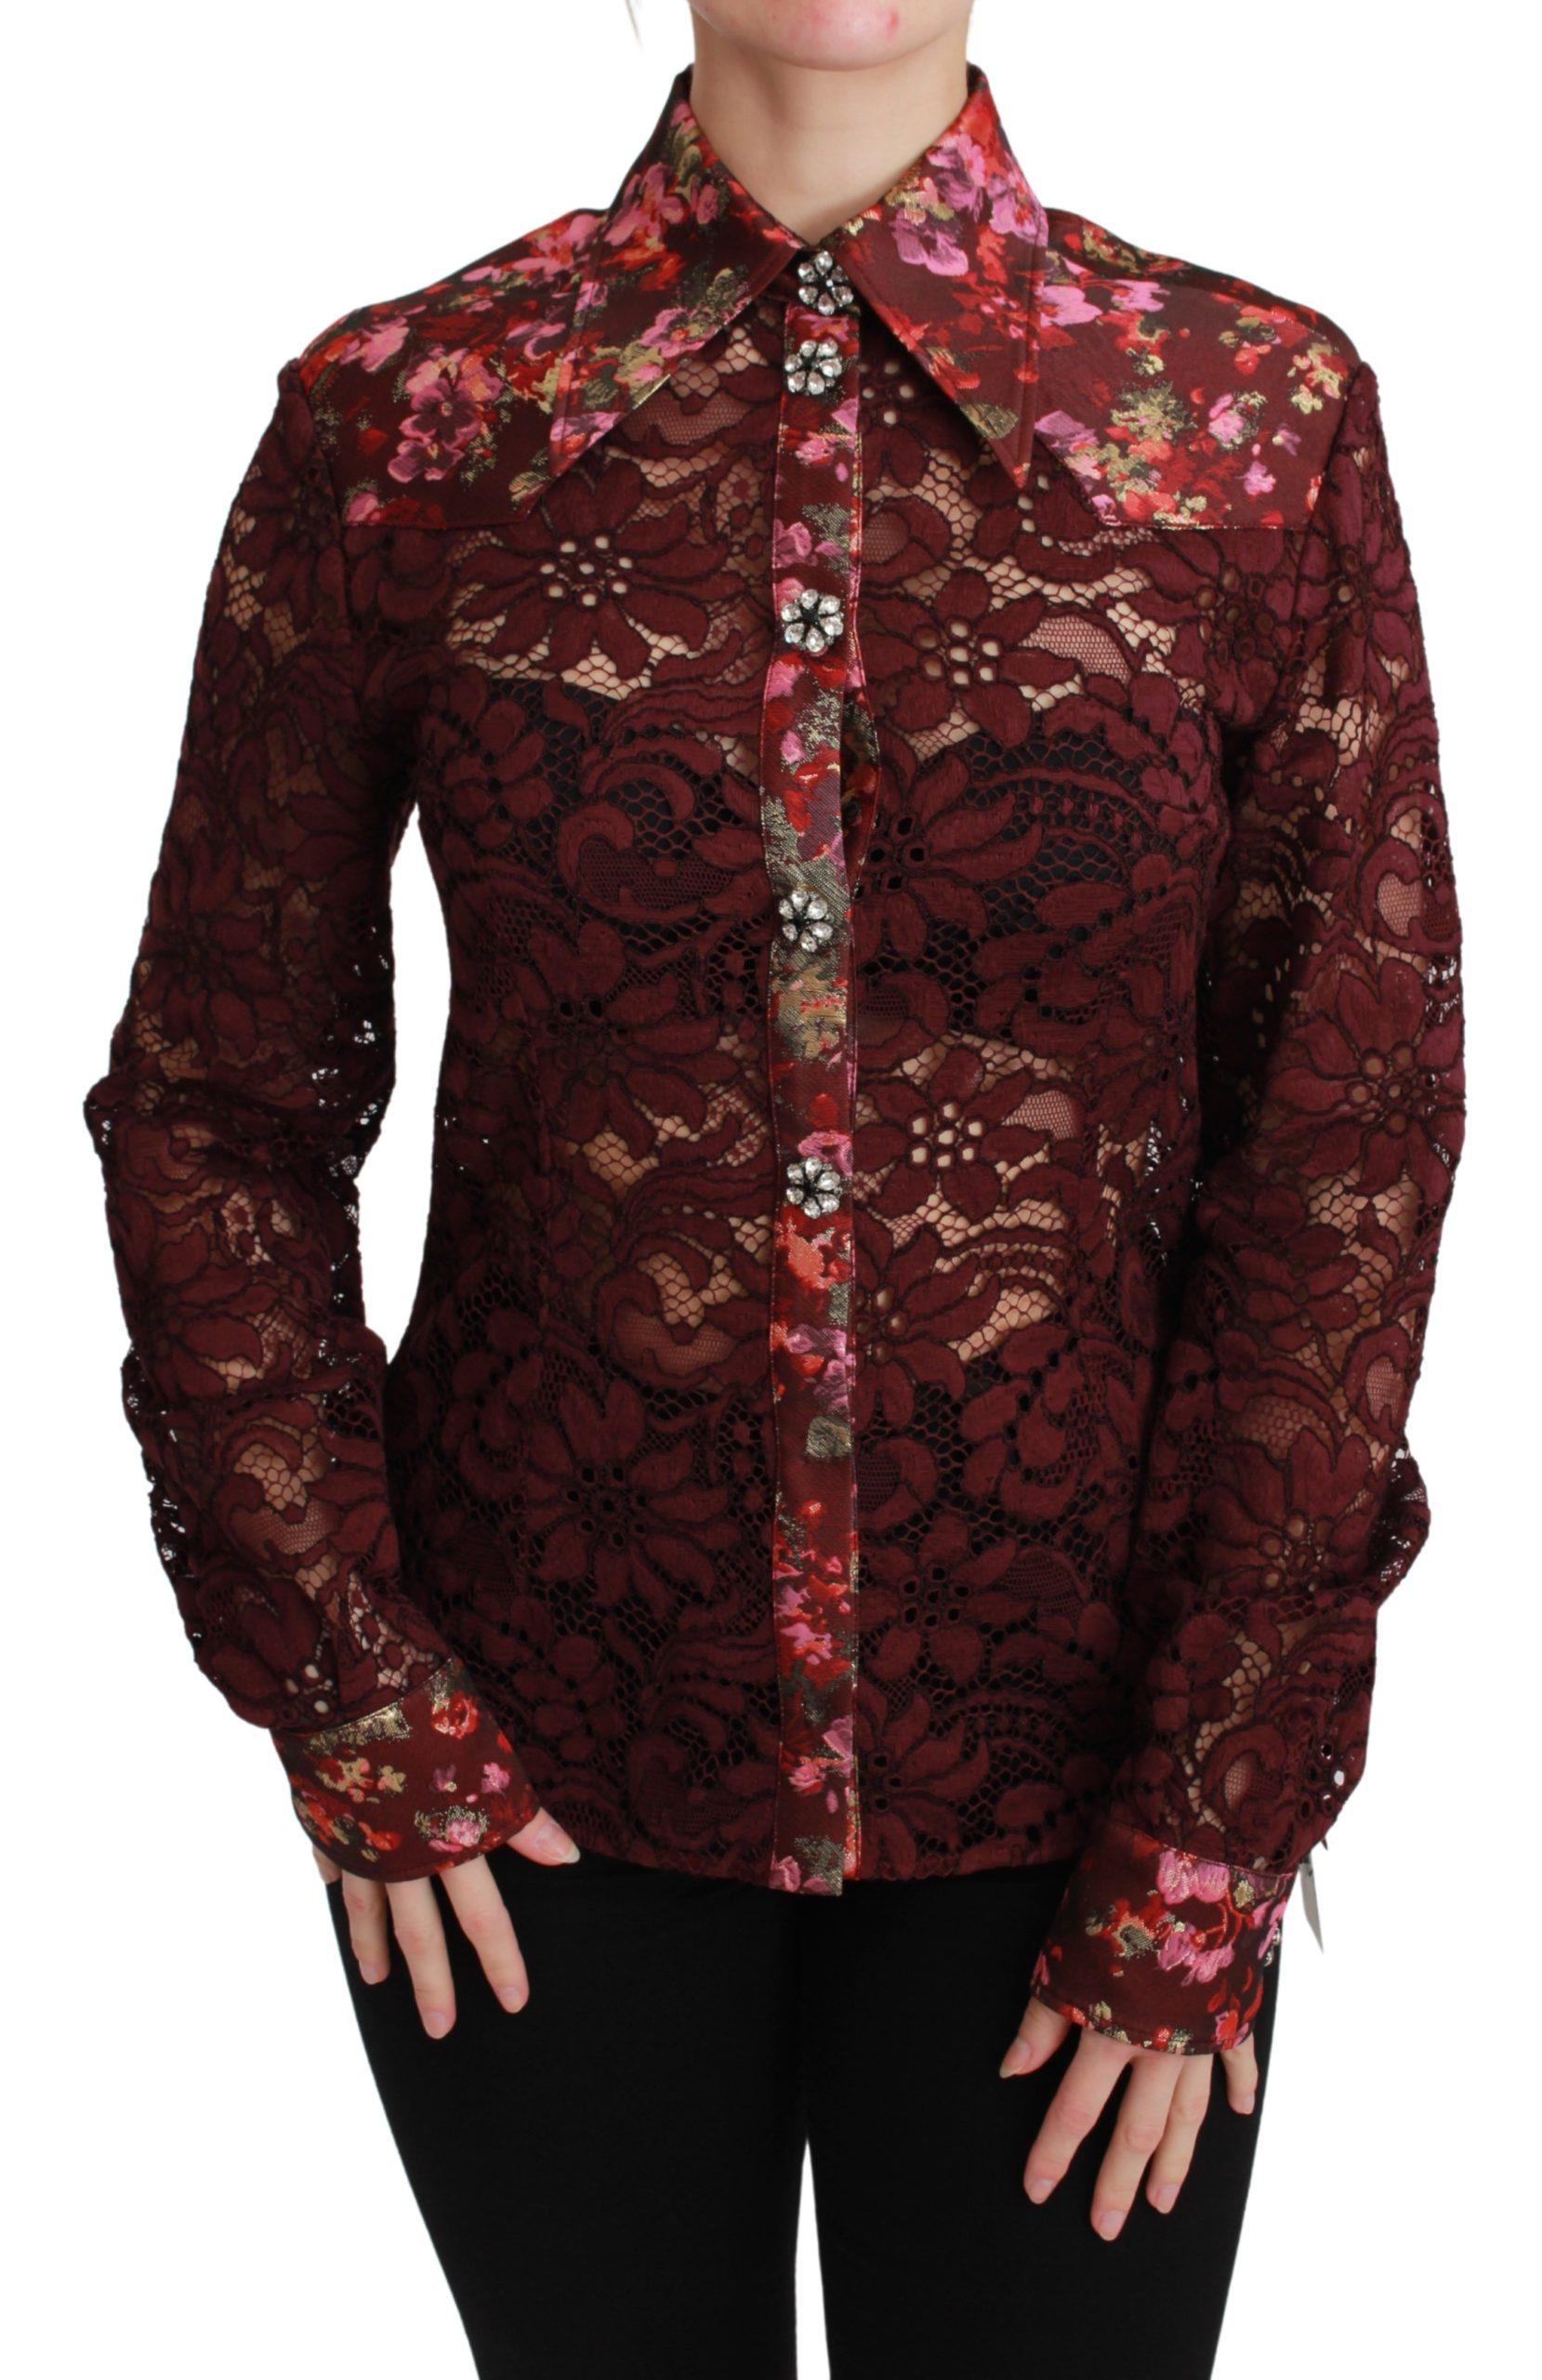 Dolce & Gabbana Women's Lace Floral Crystal Shirt Bordeaux TSH2672BG - IT38|XS